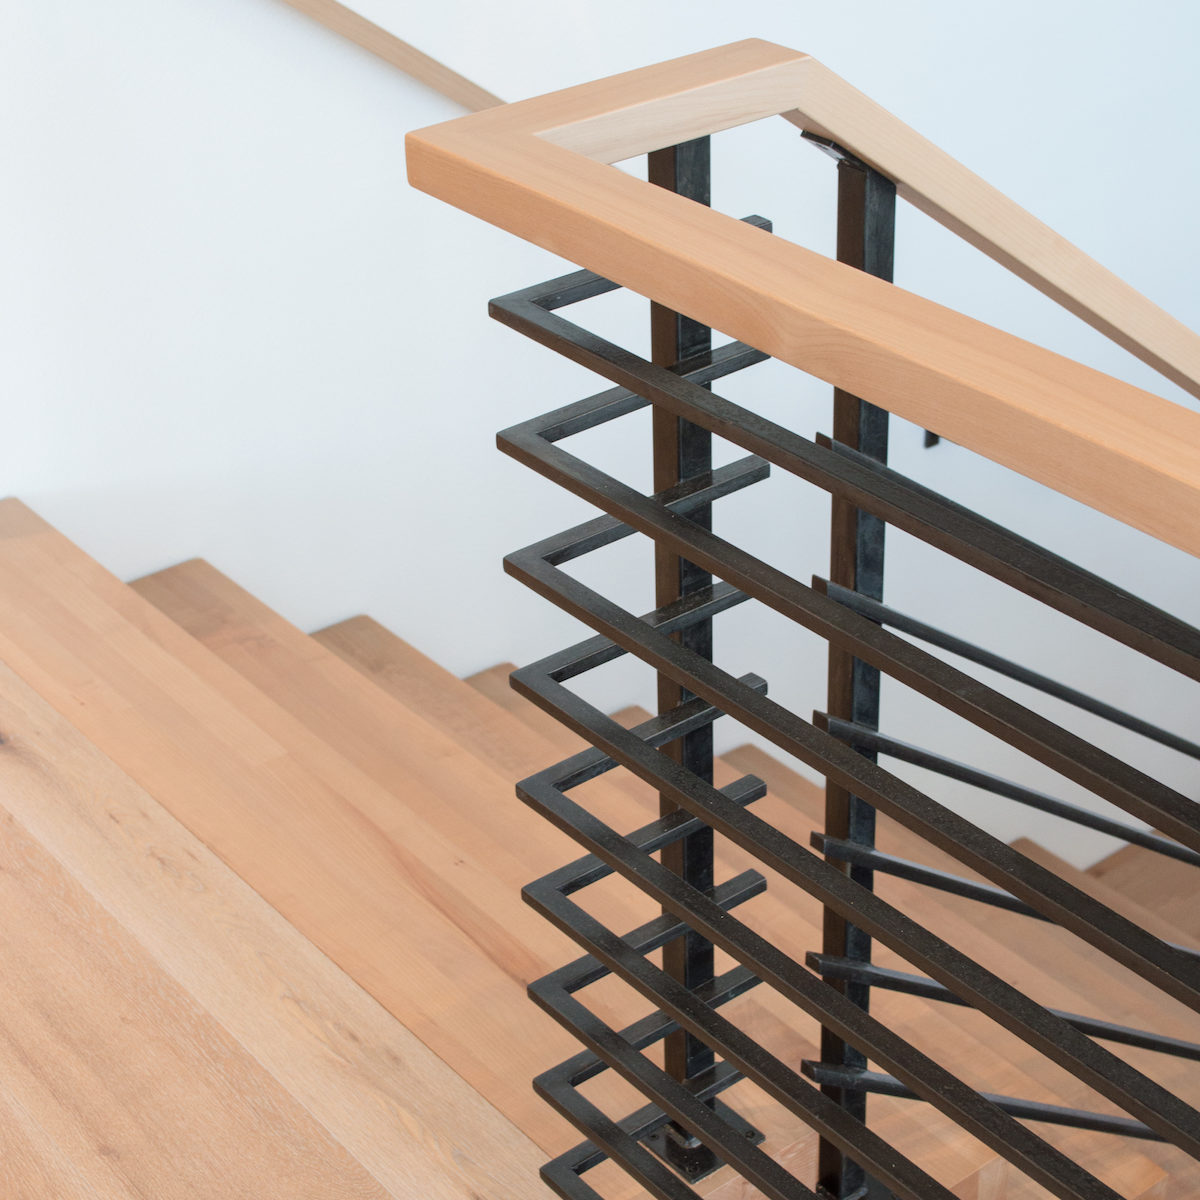 MW design workshop rail